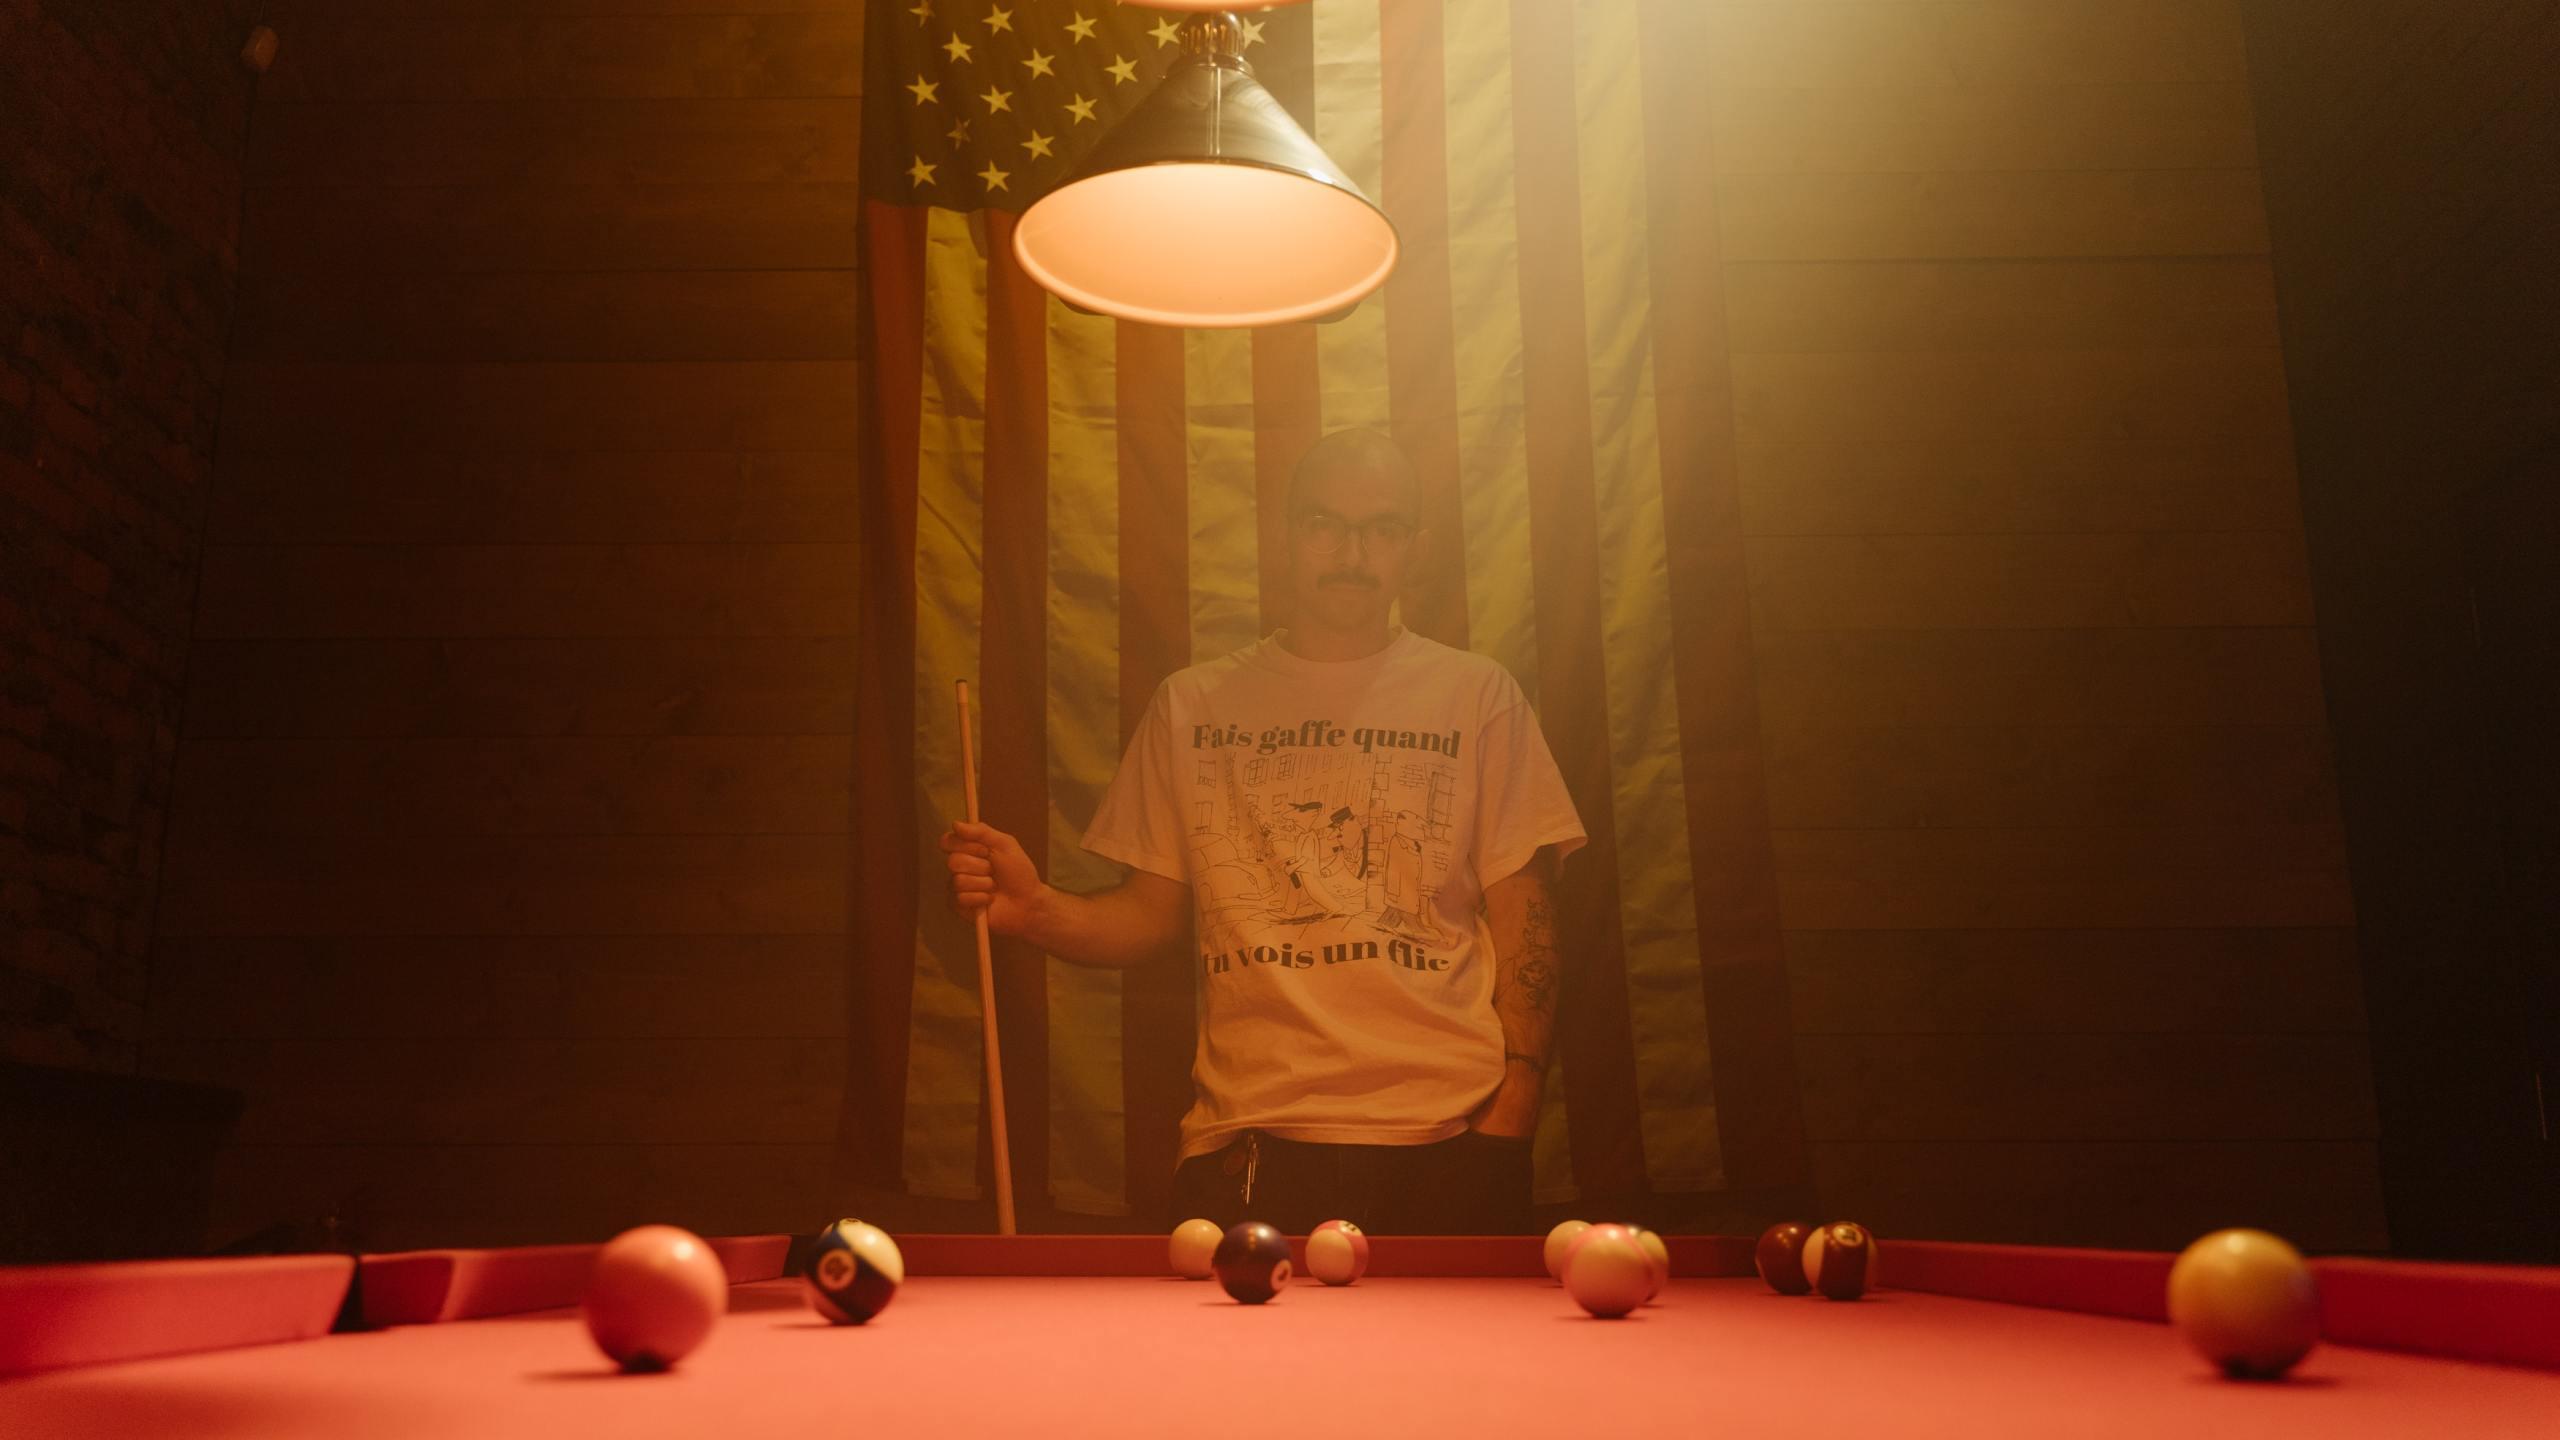 Smokey pool hall. (cottonbro / Pexels)